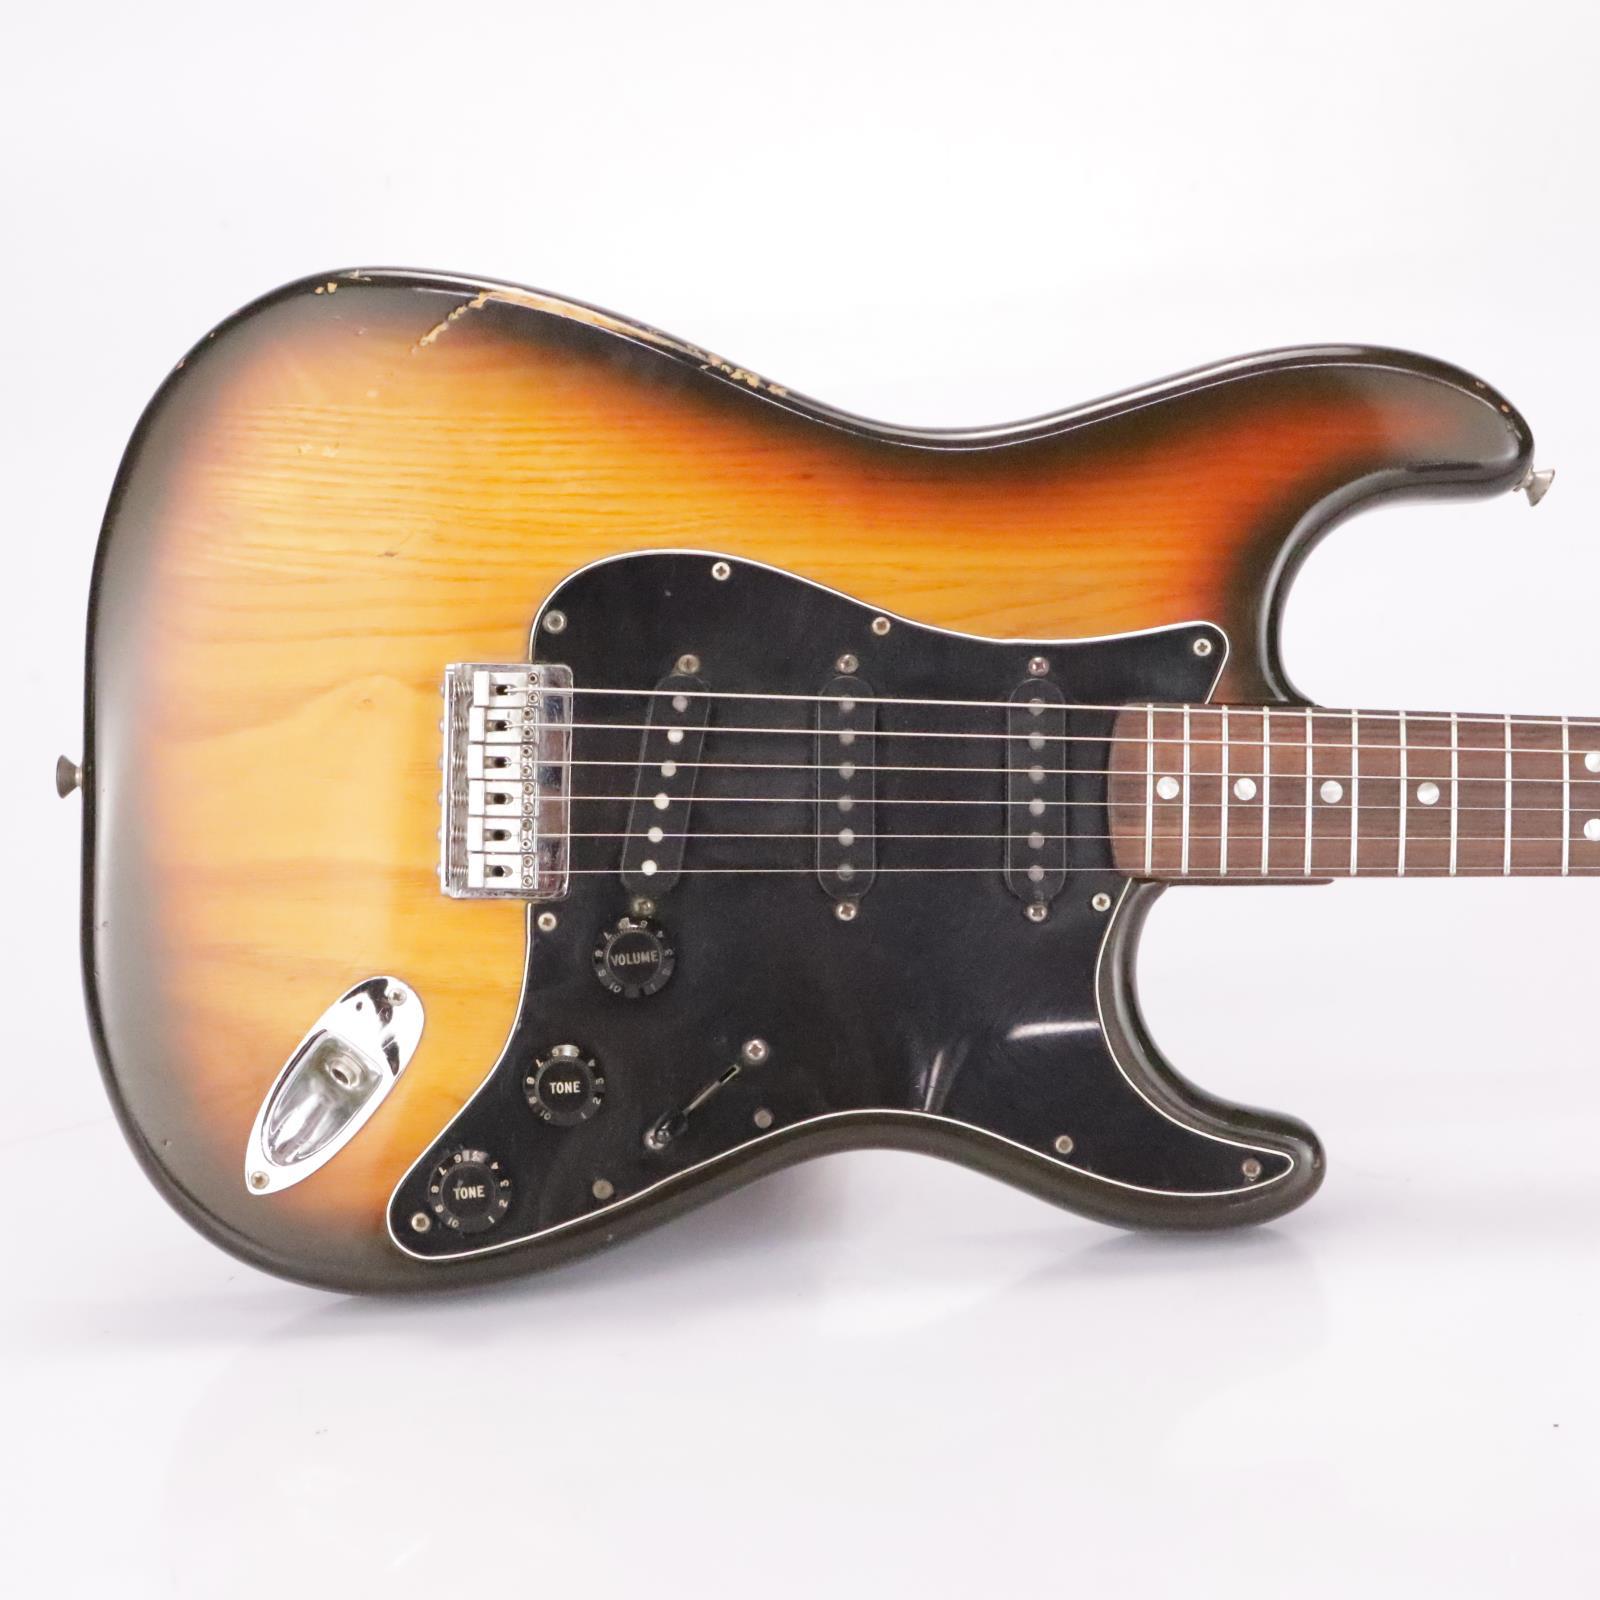 1980 Fender Stratocaster Hardtail Sunburst Rosewood Electric Guitar USA #37201